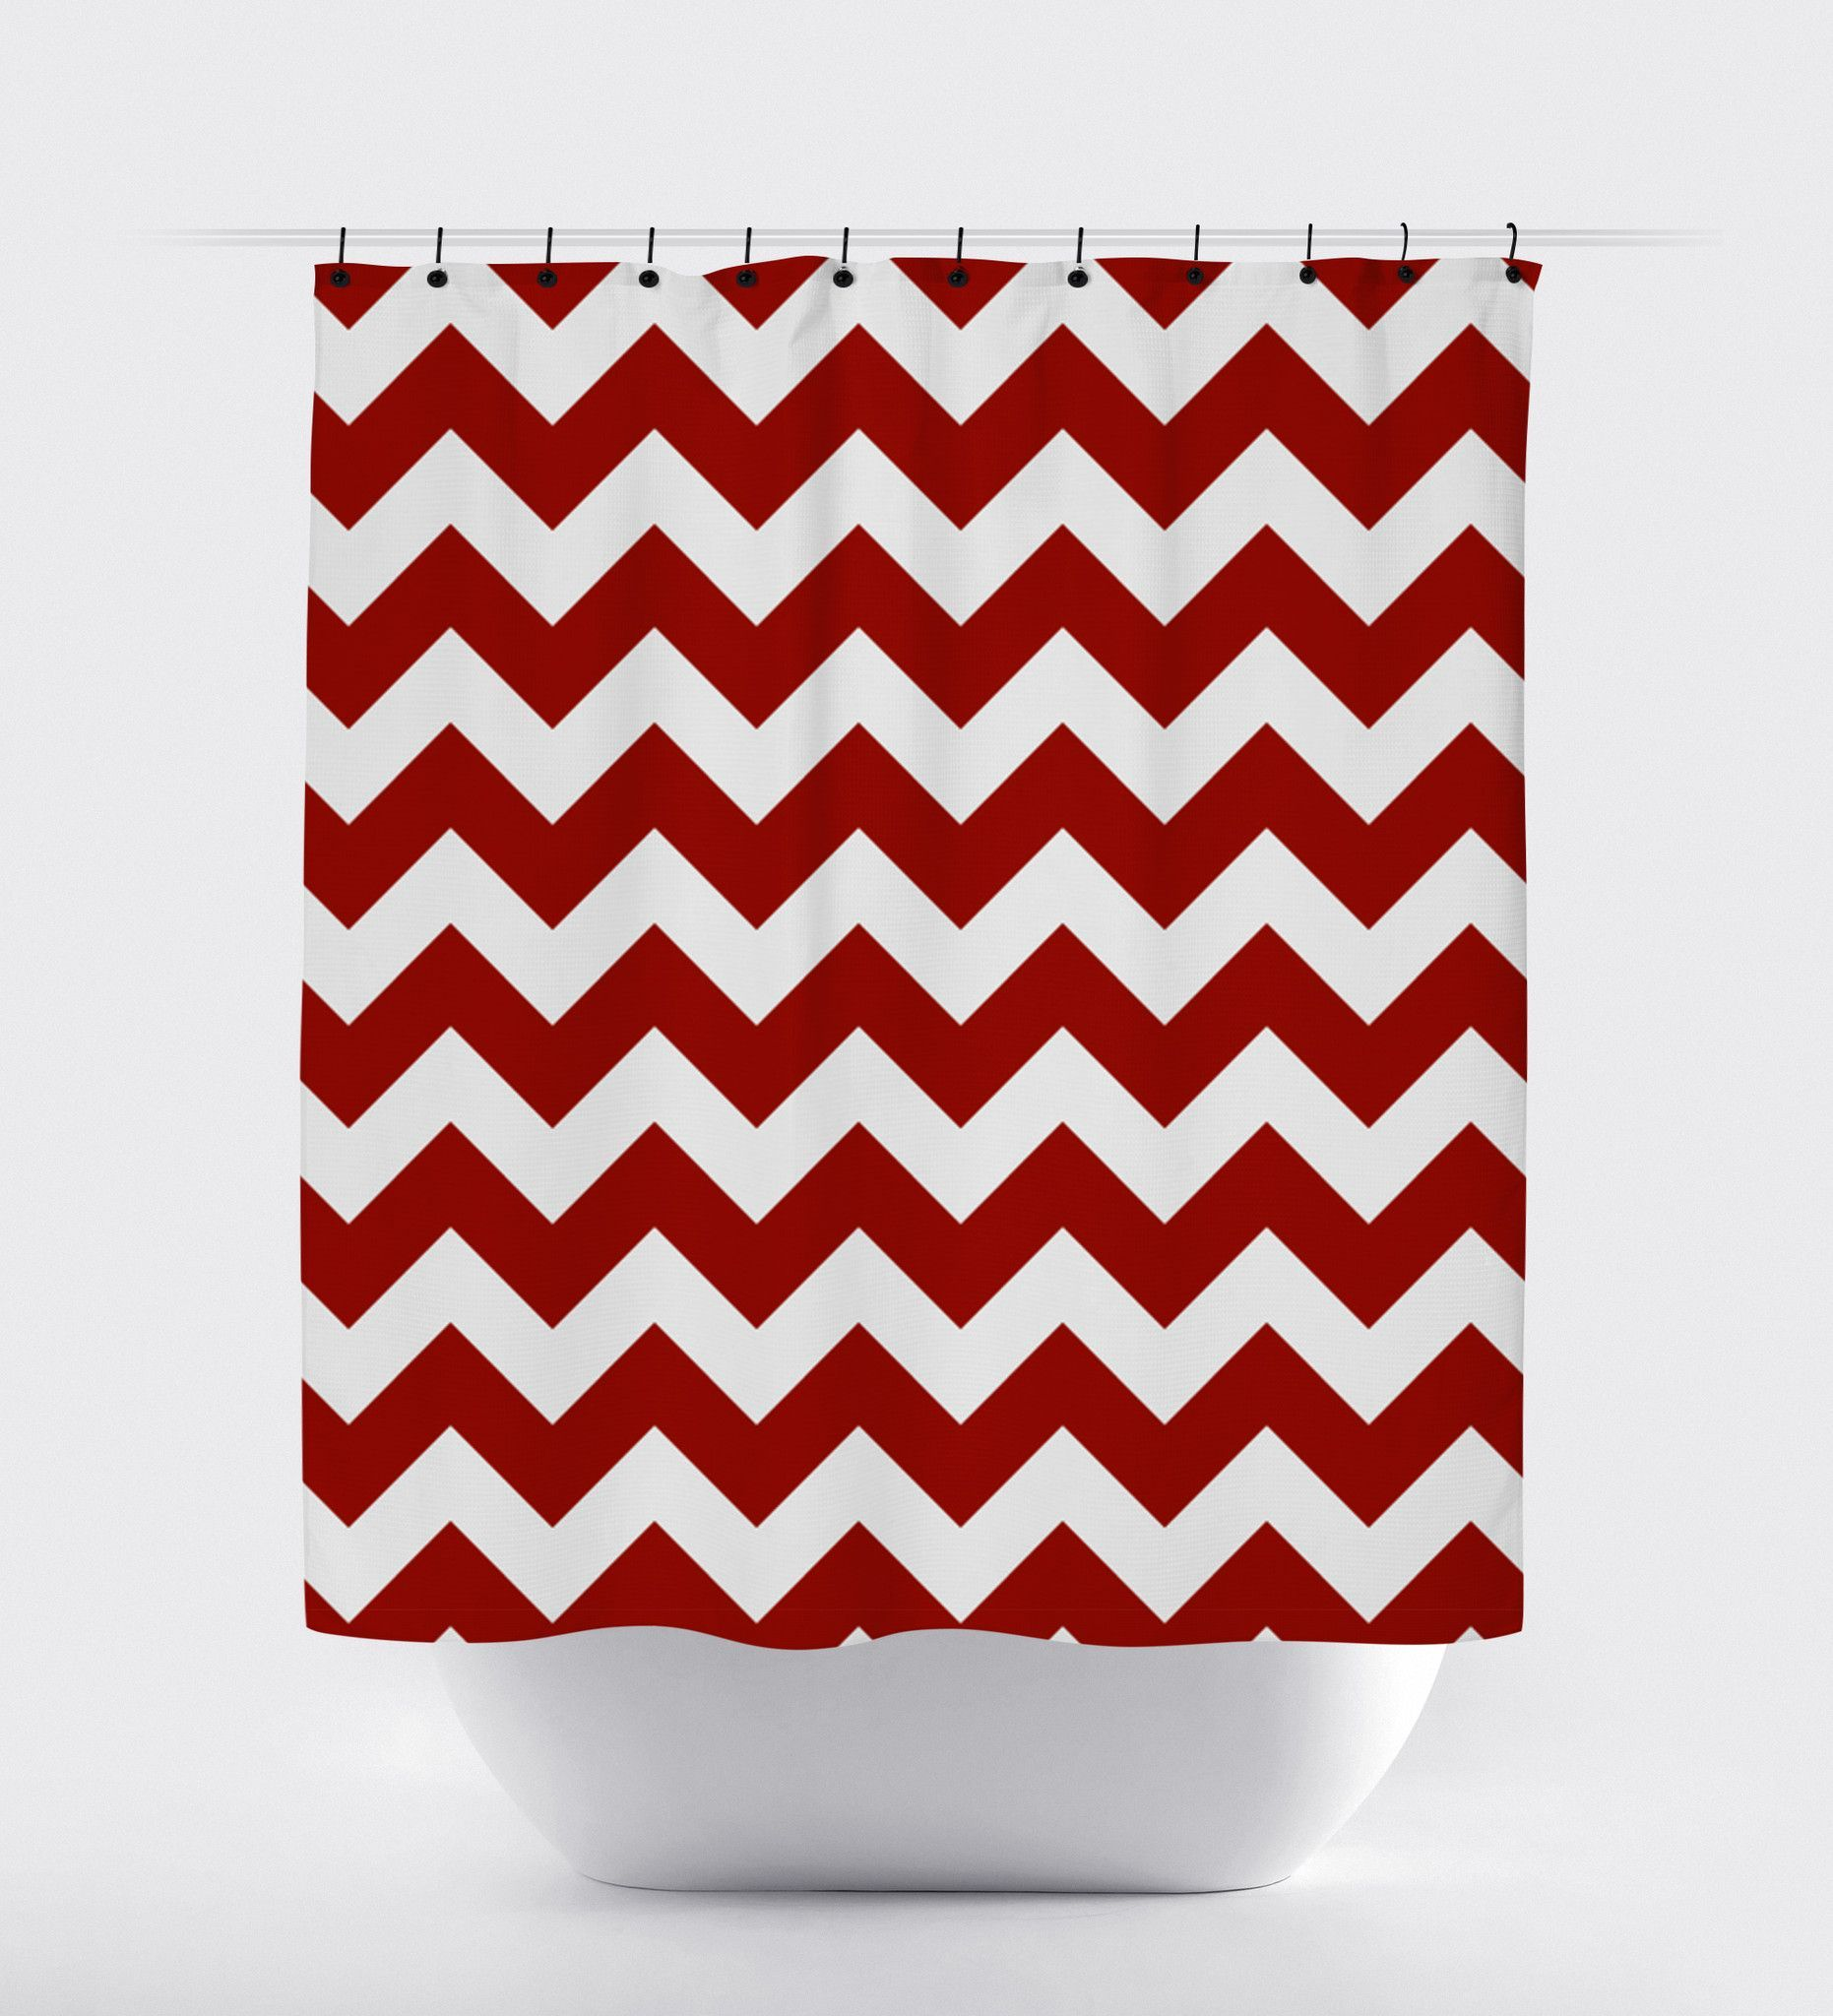 Red grey chevron shower curtain - Red Chevron Shower Curtain